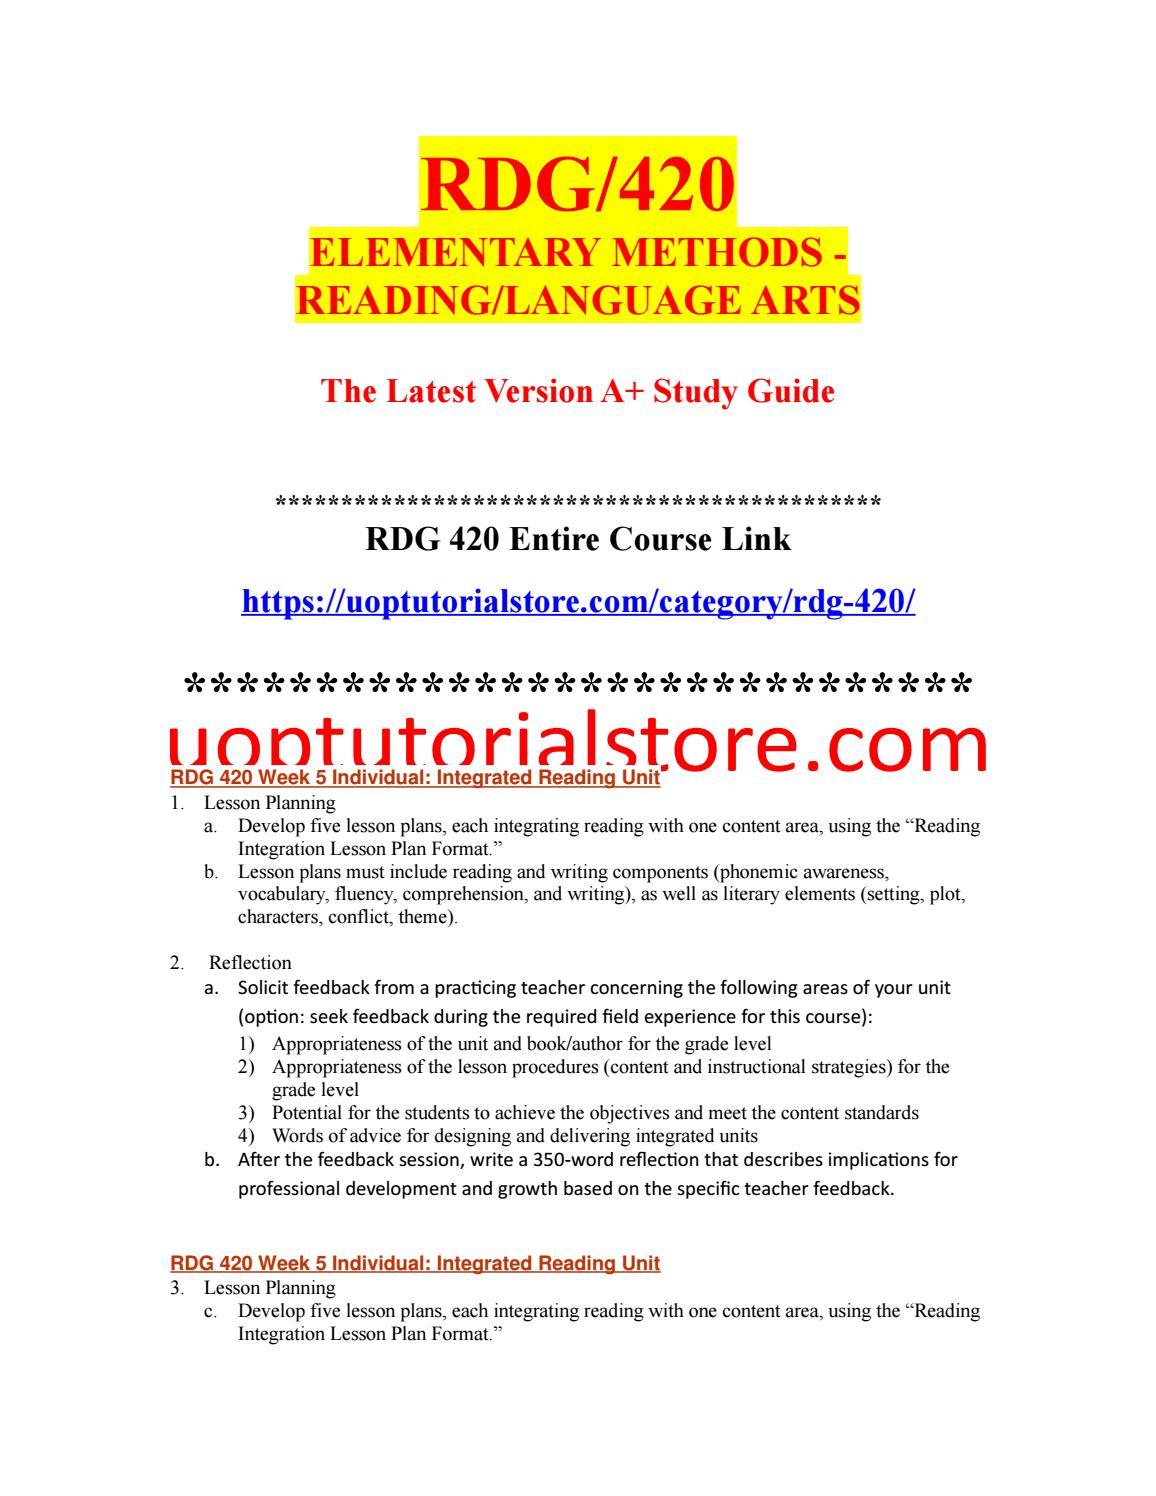 RDG 420 Week 5 Individual Integrated Reading Unit (2